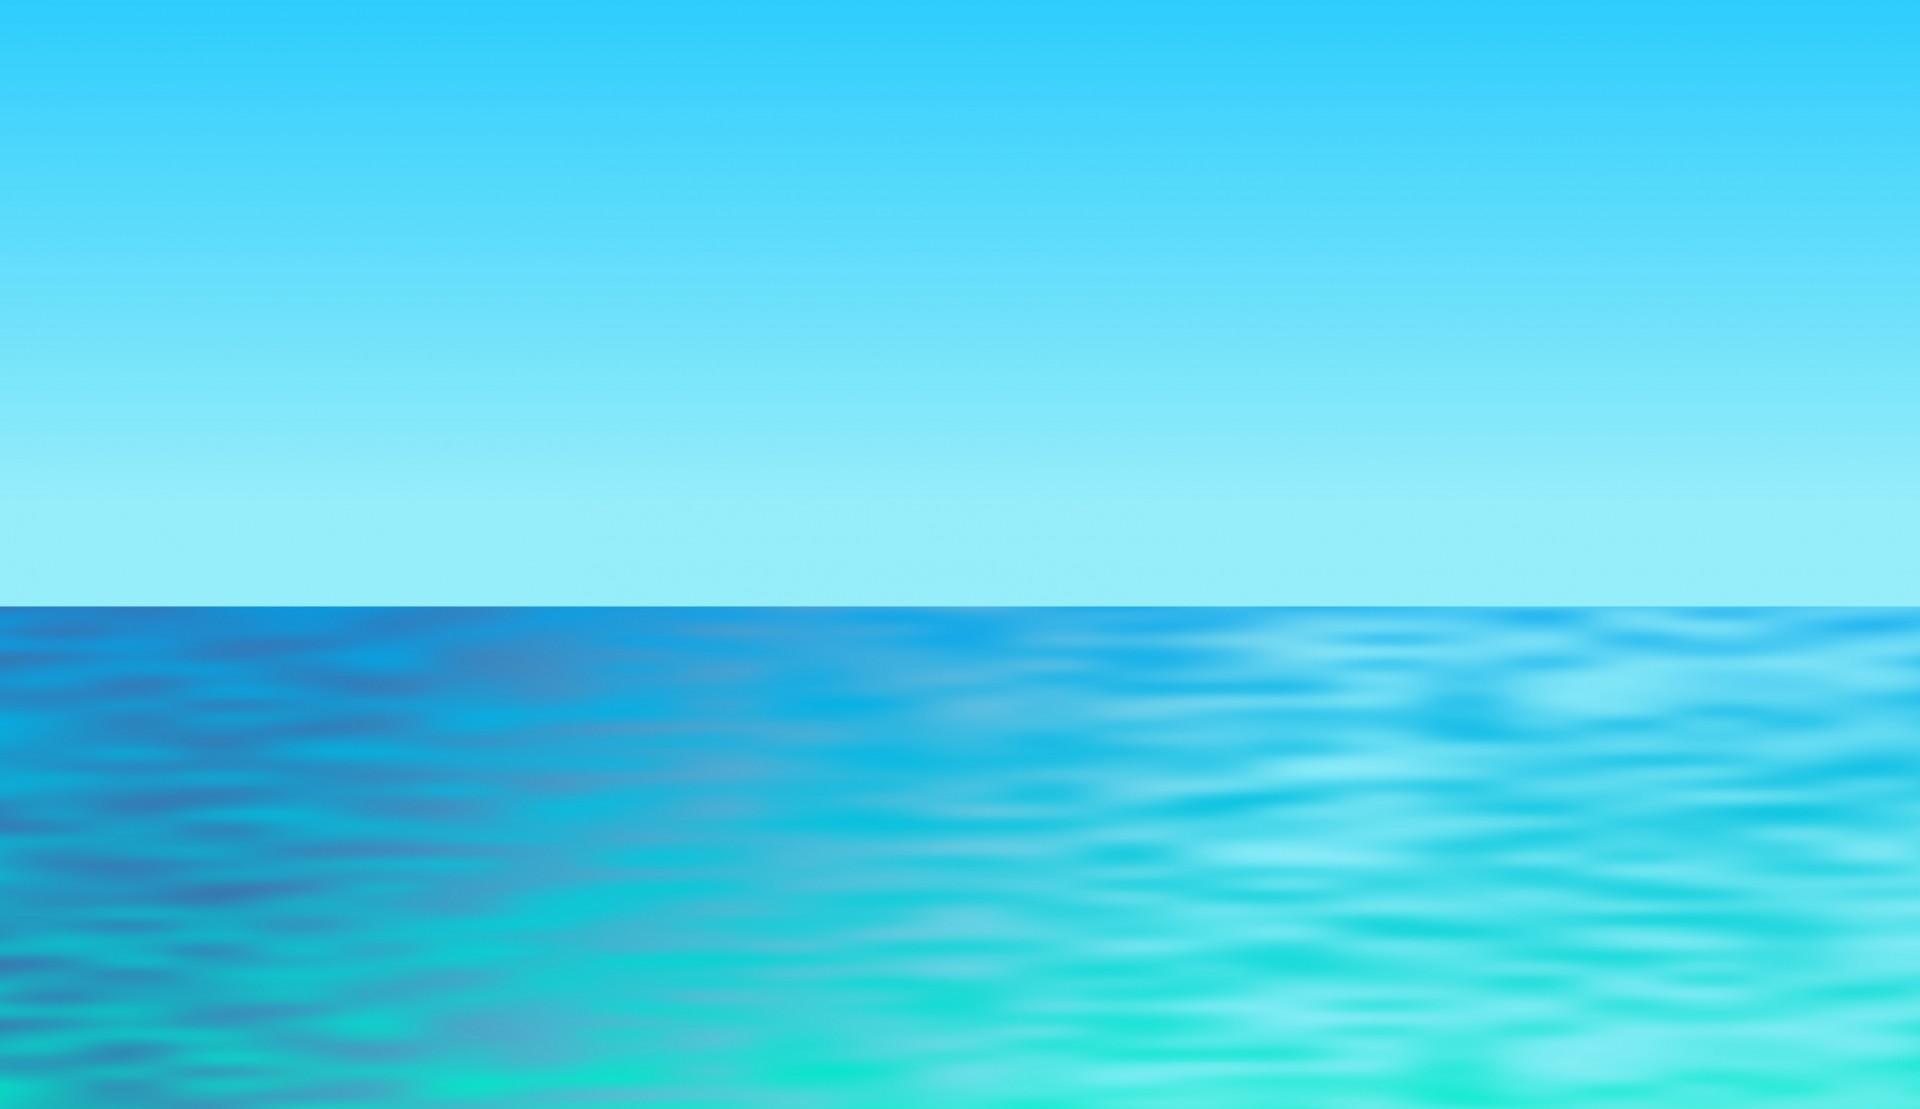 Water clipart ocean. Clip art illustration graphic